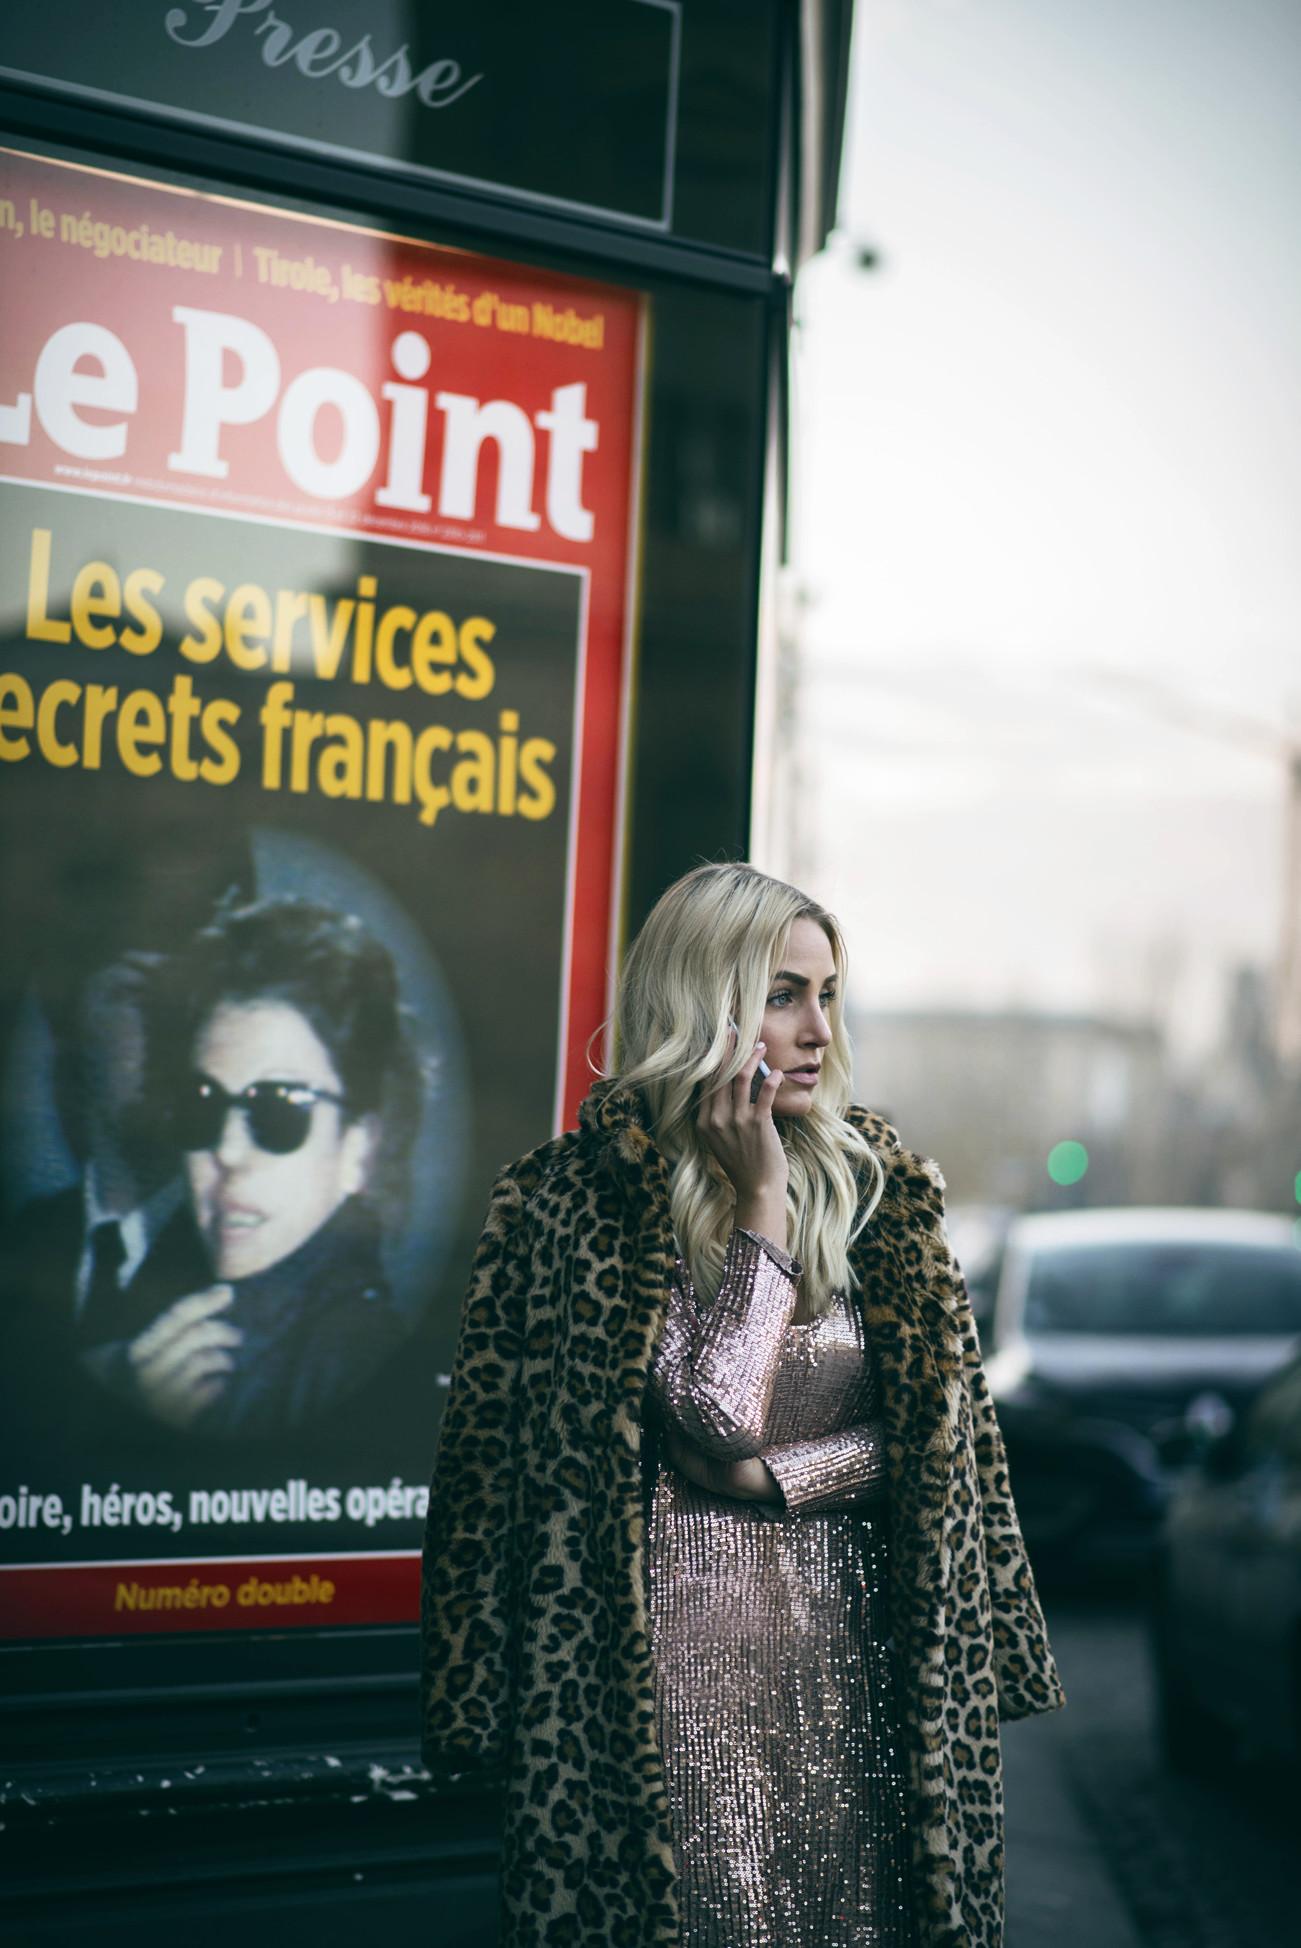 fashionblogger-blogger-streetstyle-paris-sequinsophia-4___00000-9349